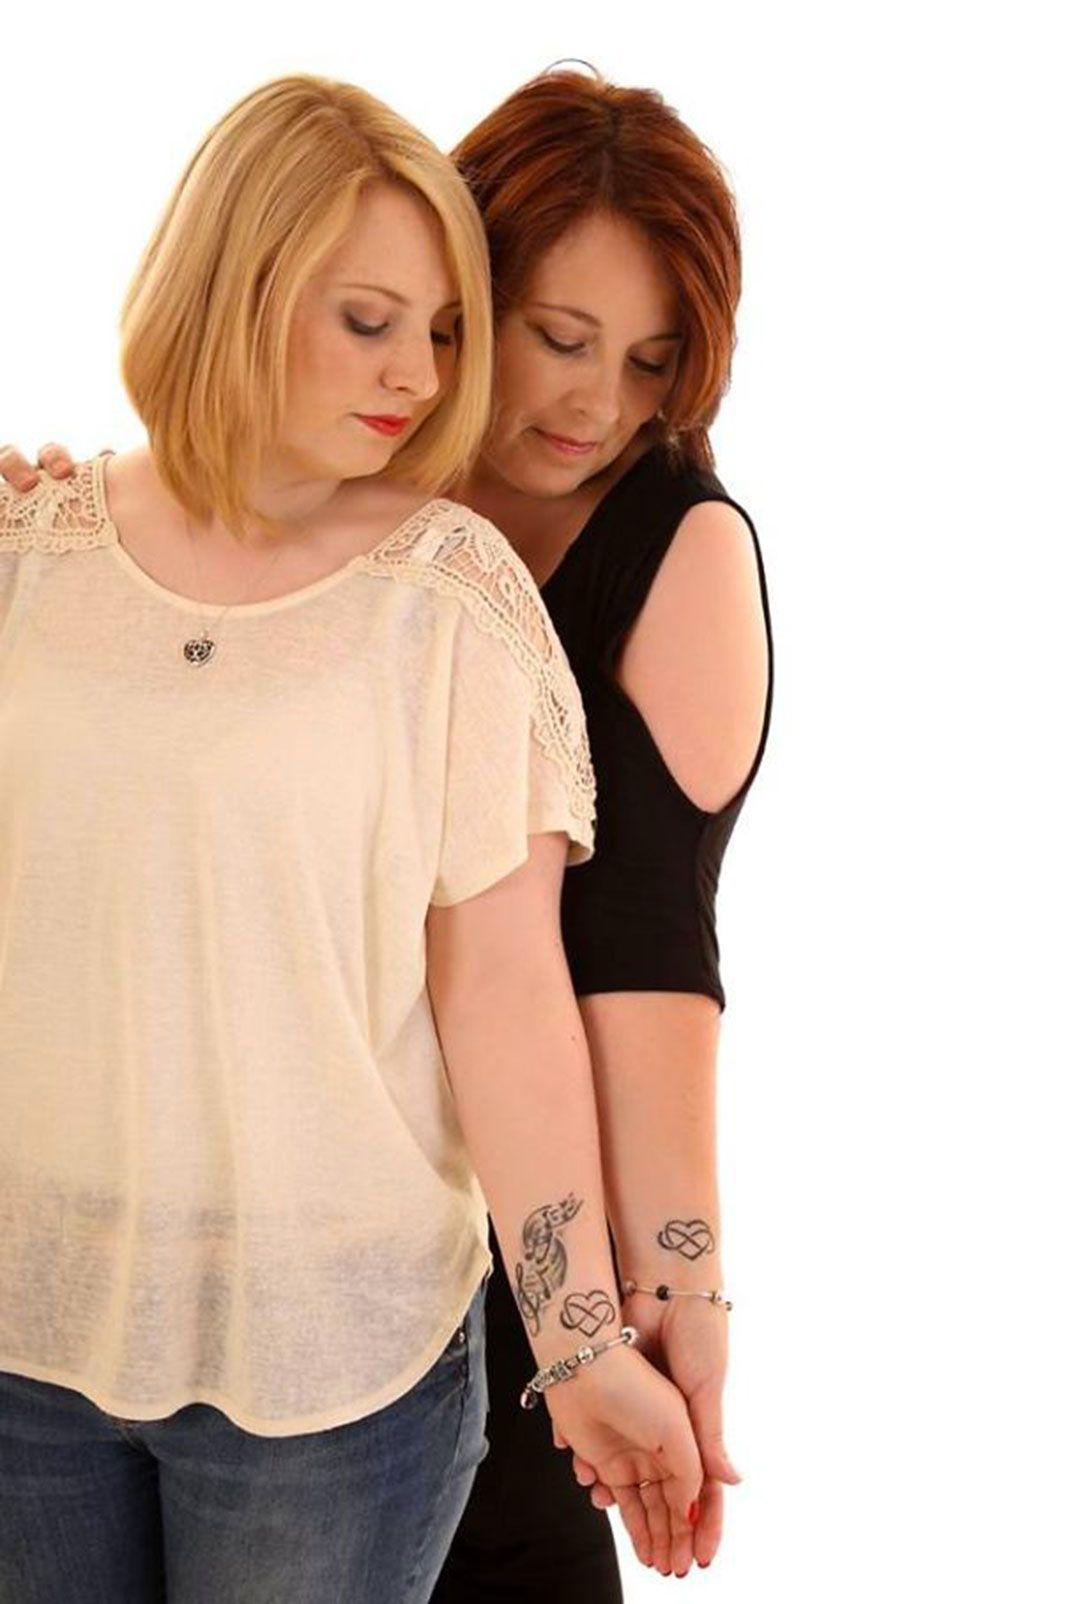 tatouage meilleure amie poignet coeur